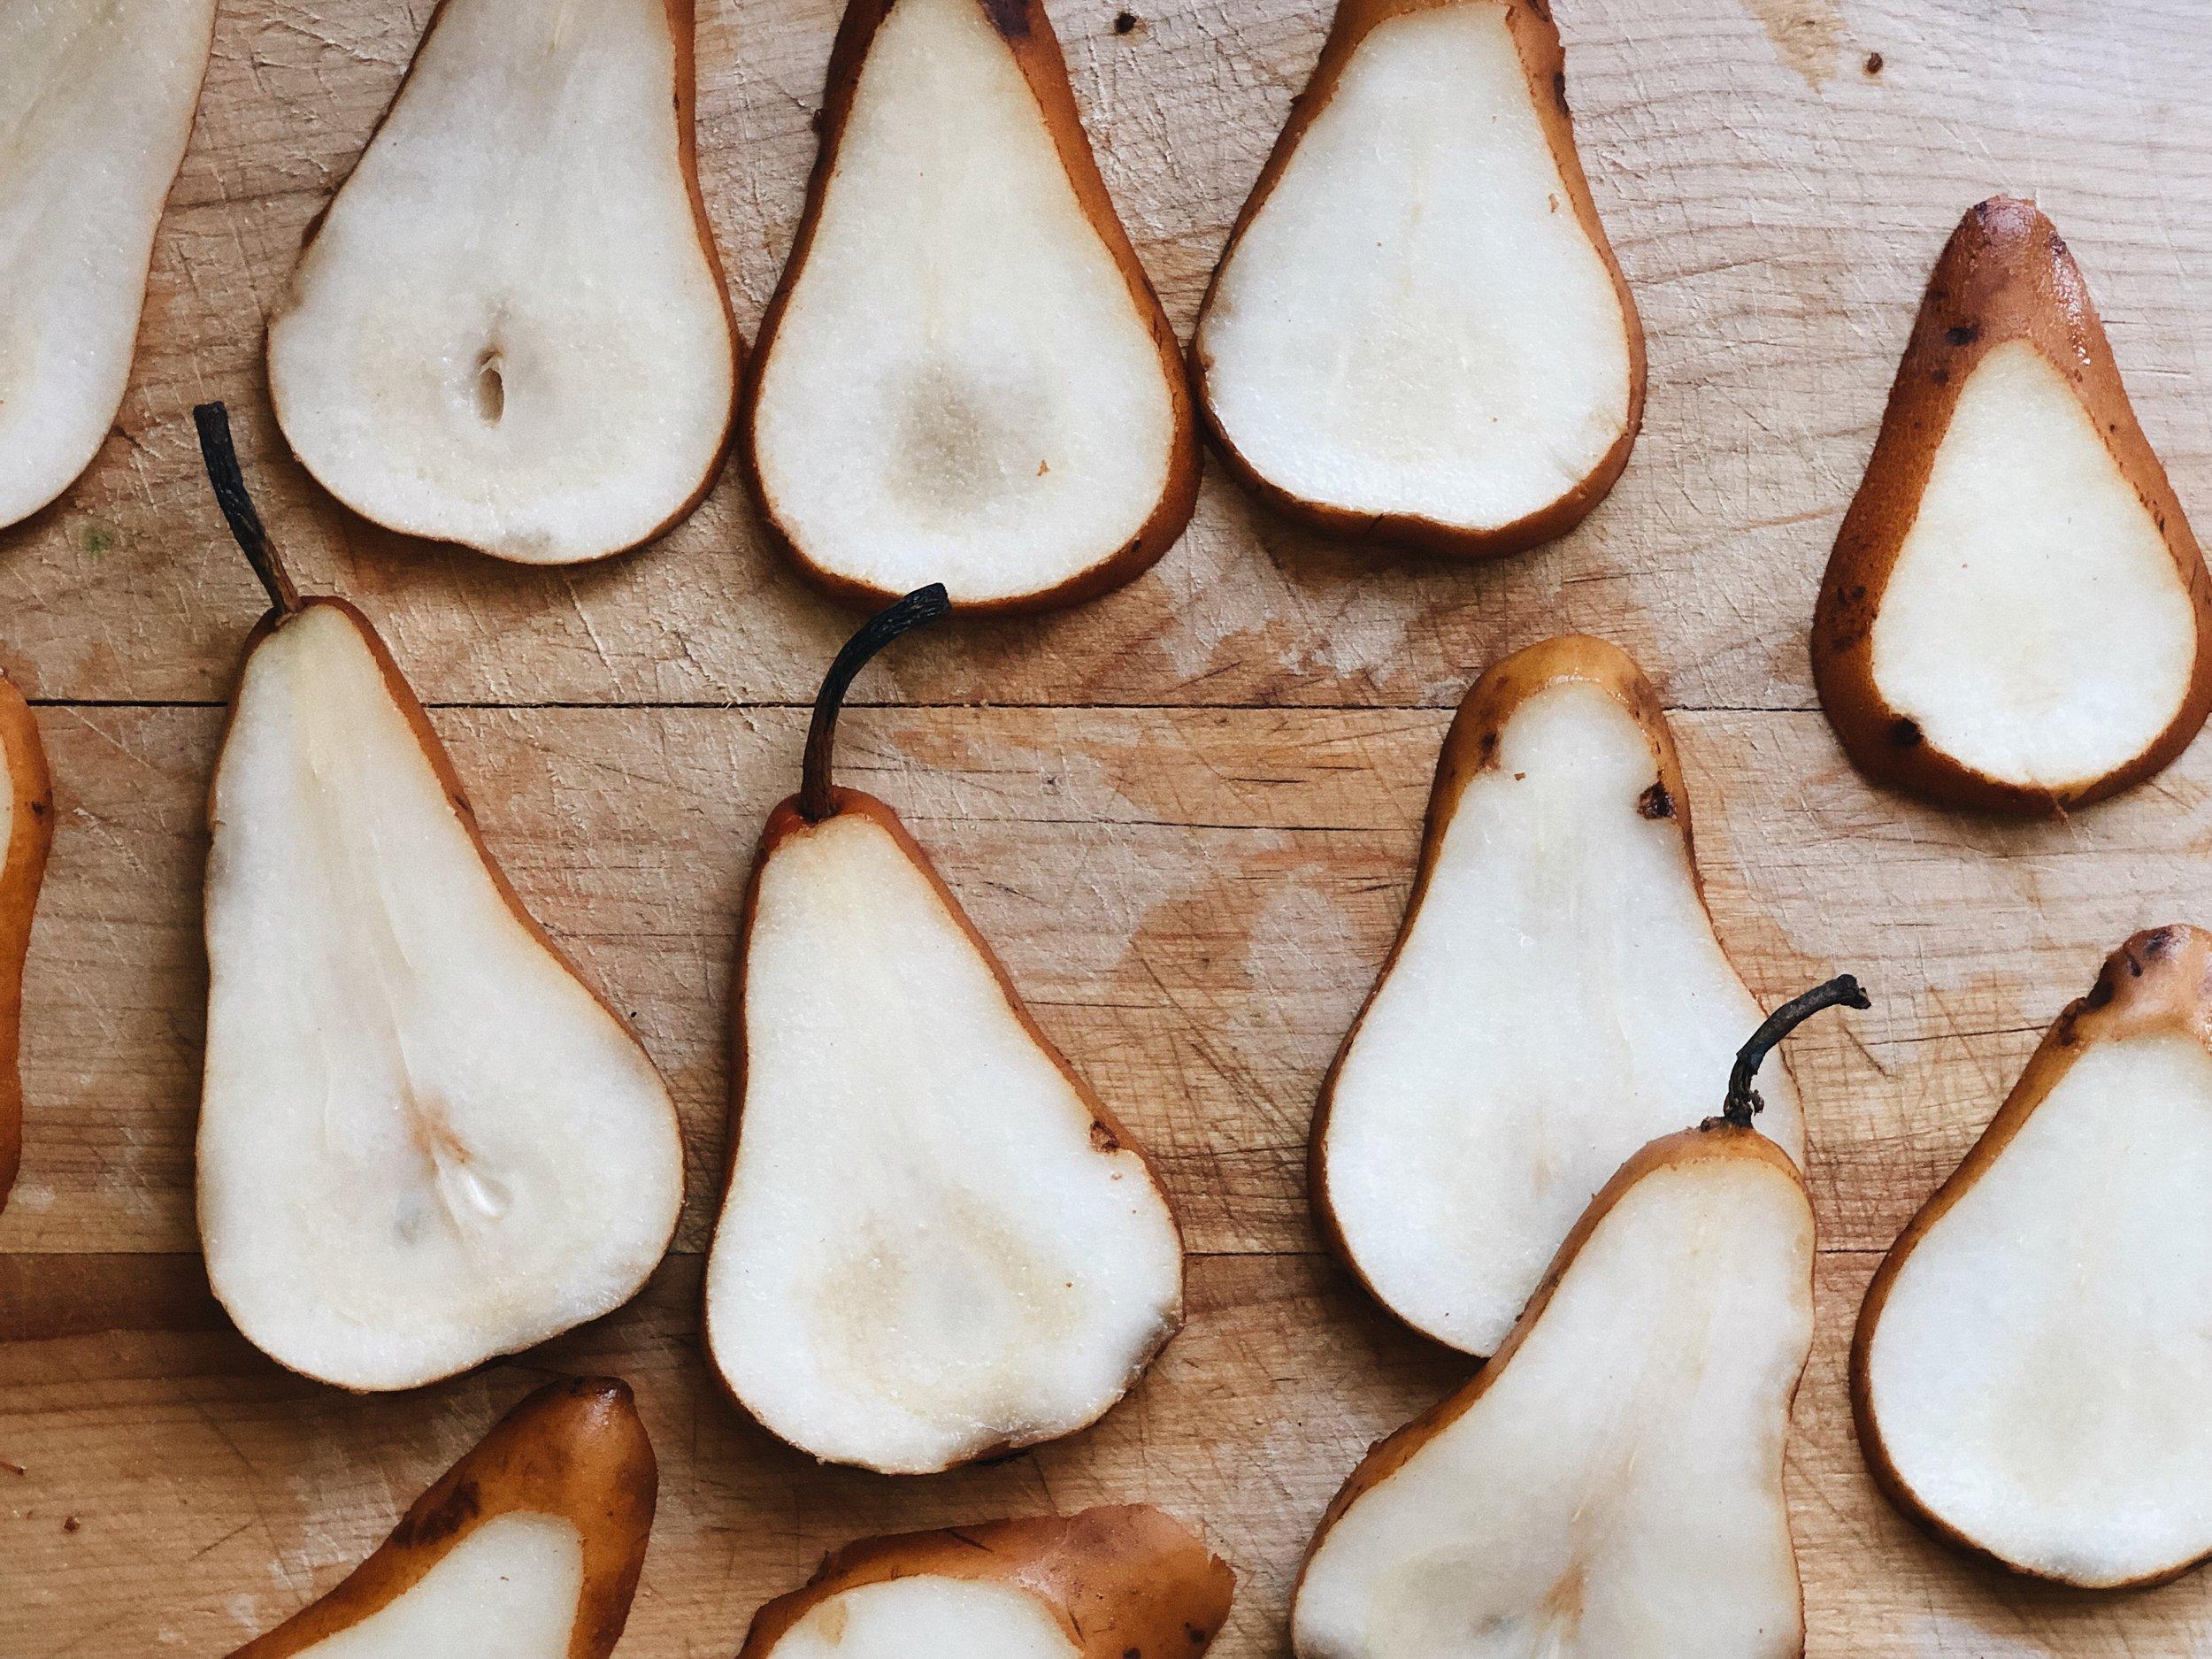 cut pears laying on wood board